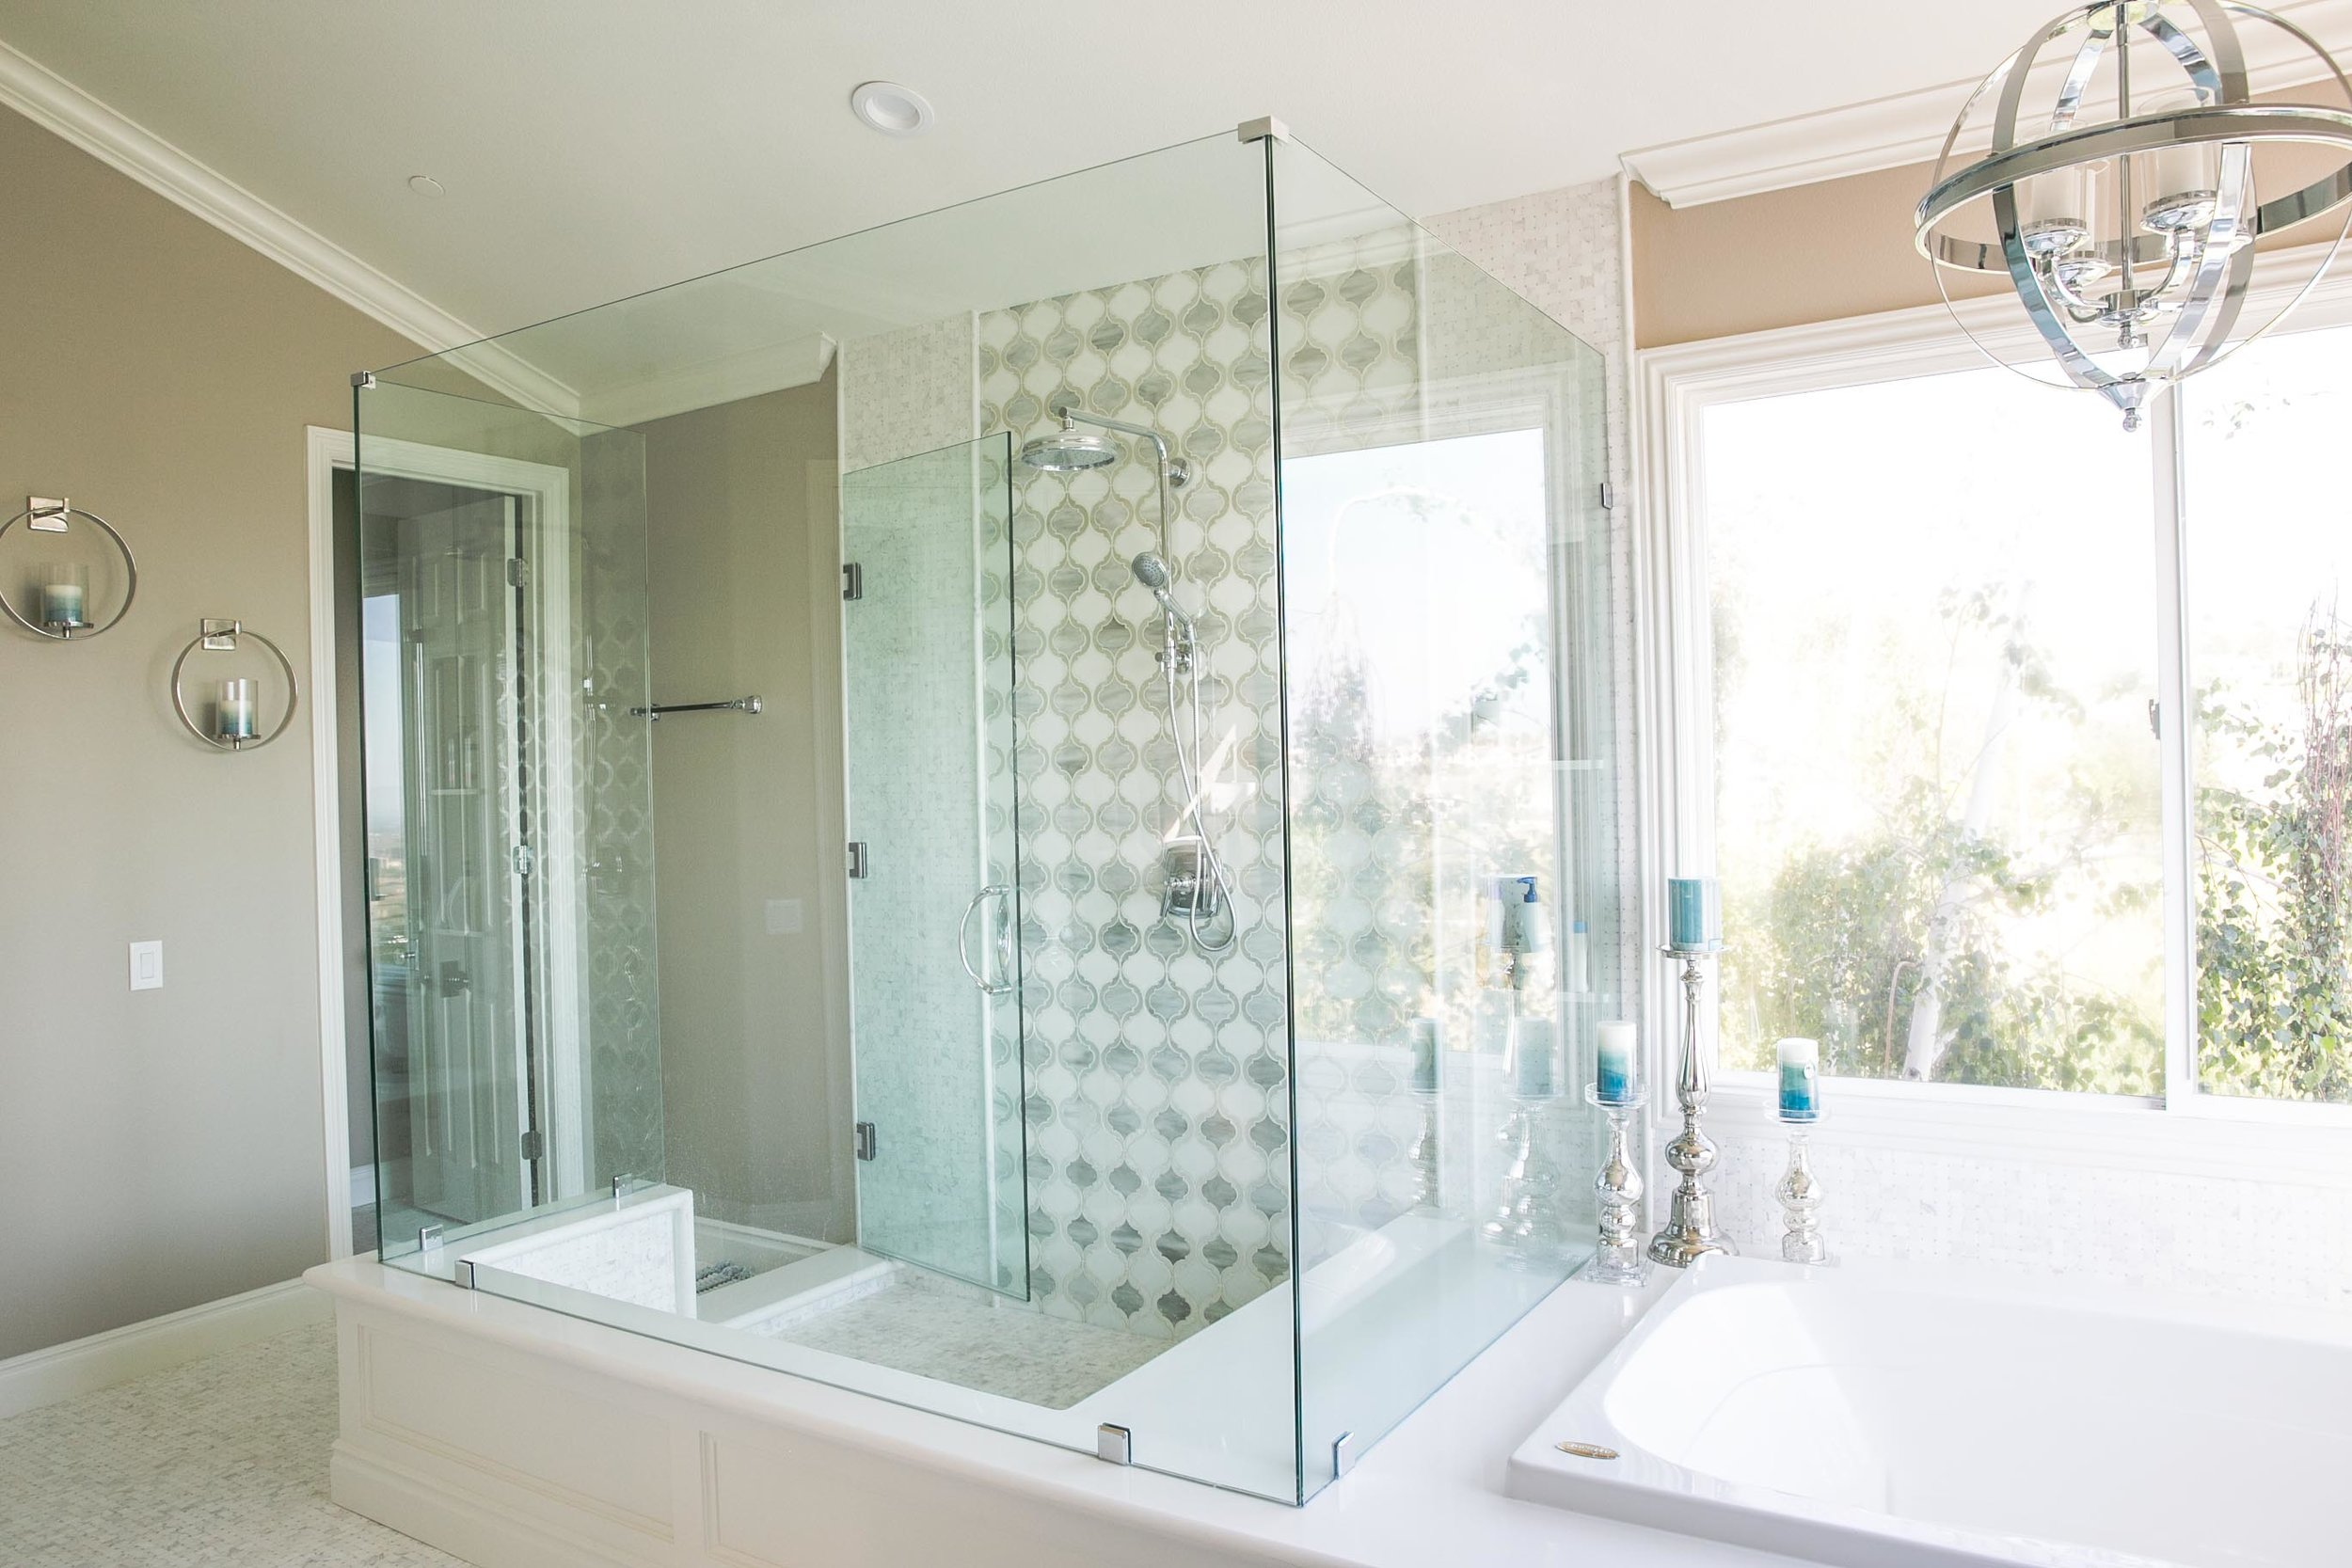 RESIDENTIAL GLASS - - Frameless Shower Glass- Shower service & Restoration- Mirrors- Window Film- Doors & Windows- Wardrobe- Sliding Glass Doors- Replacement Glass & Window Repair